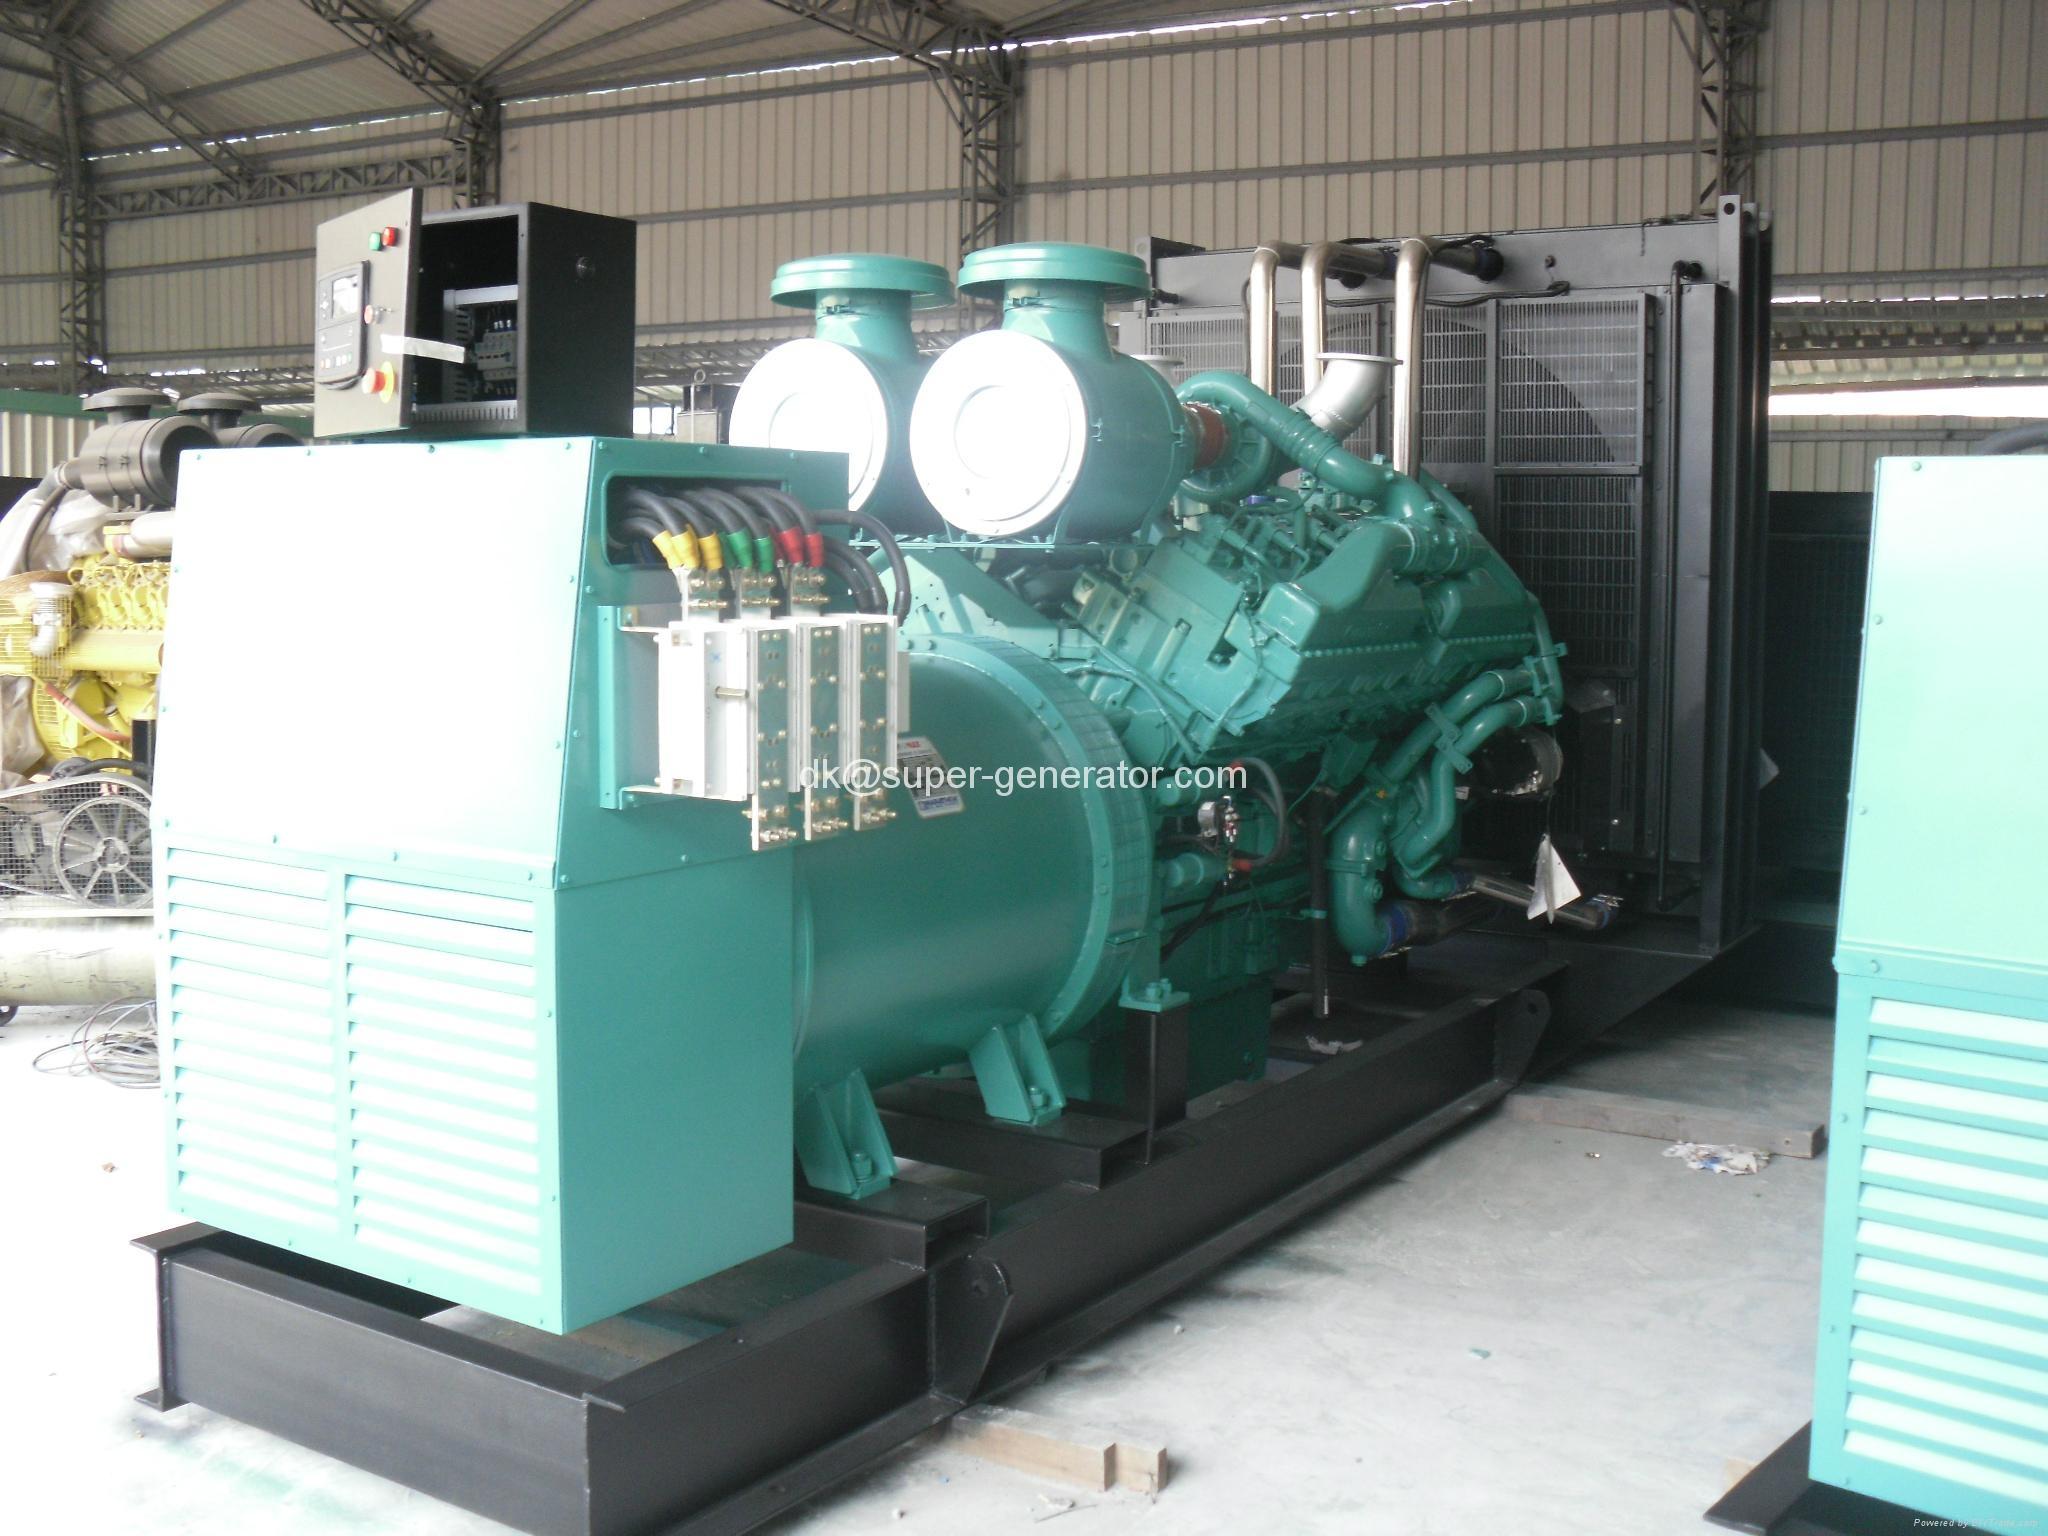 Cummins generator KTA38 G5 sel generators KTA50 G3 1250kva